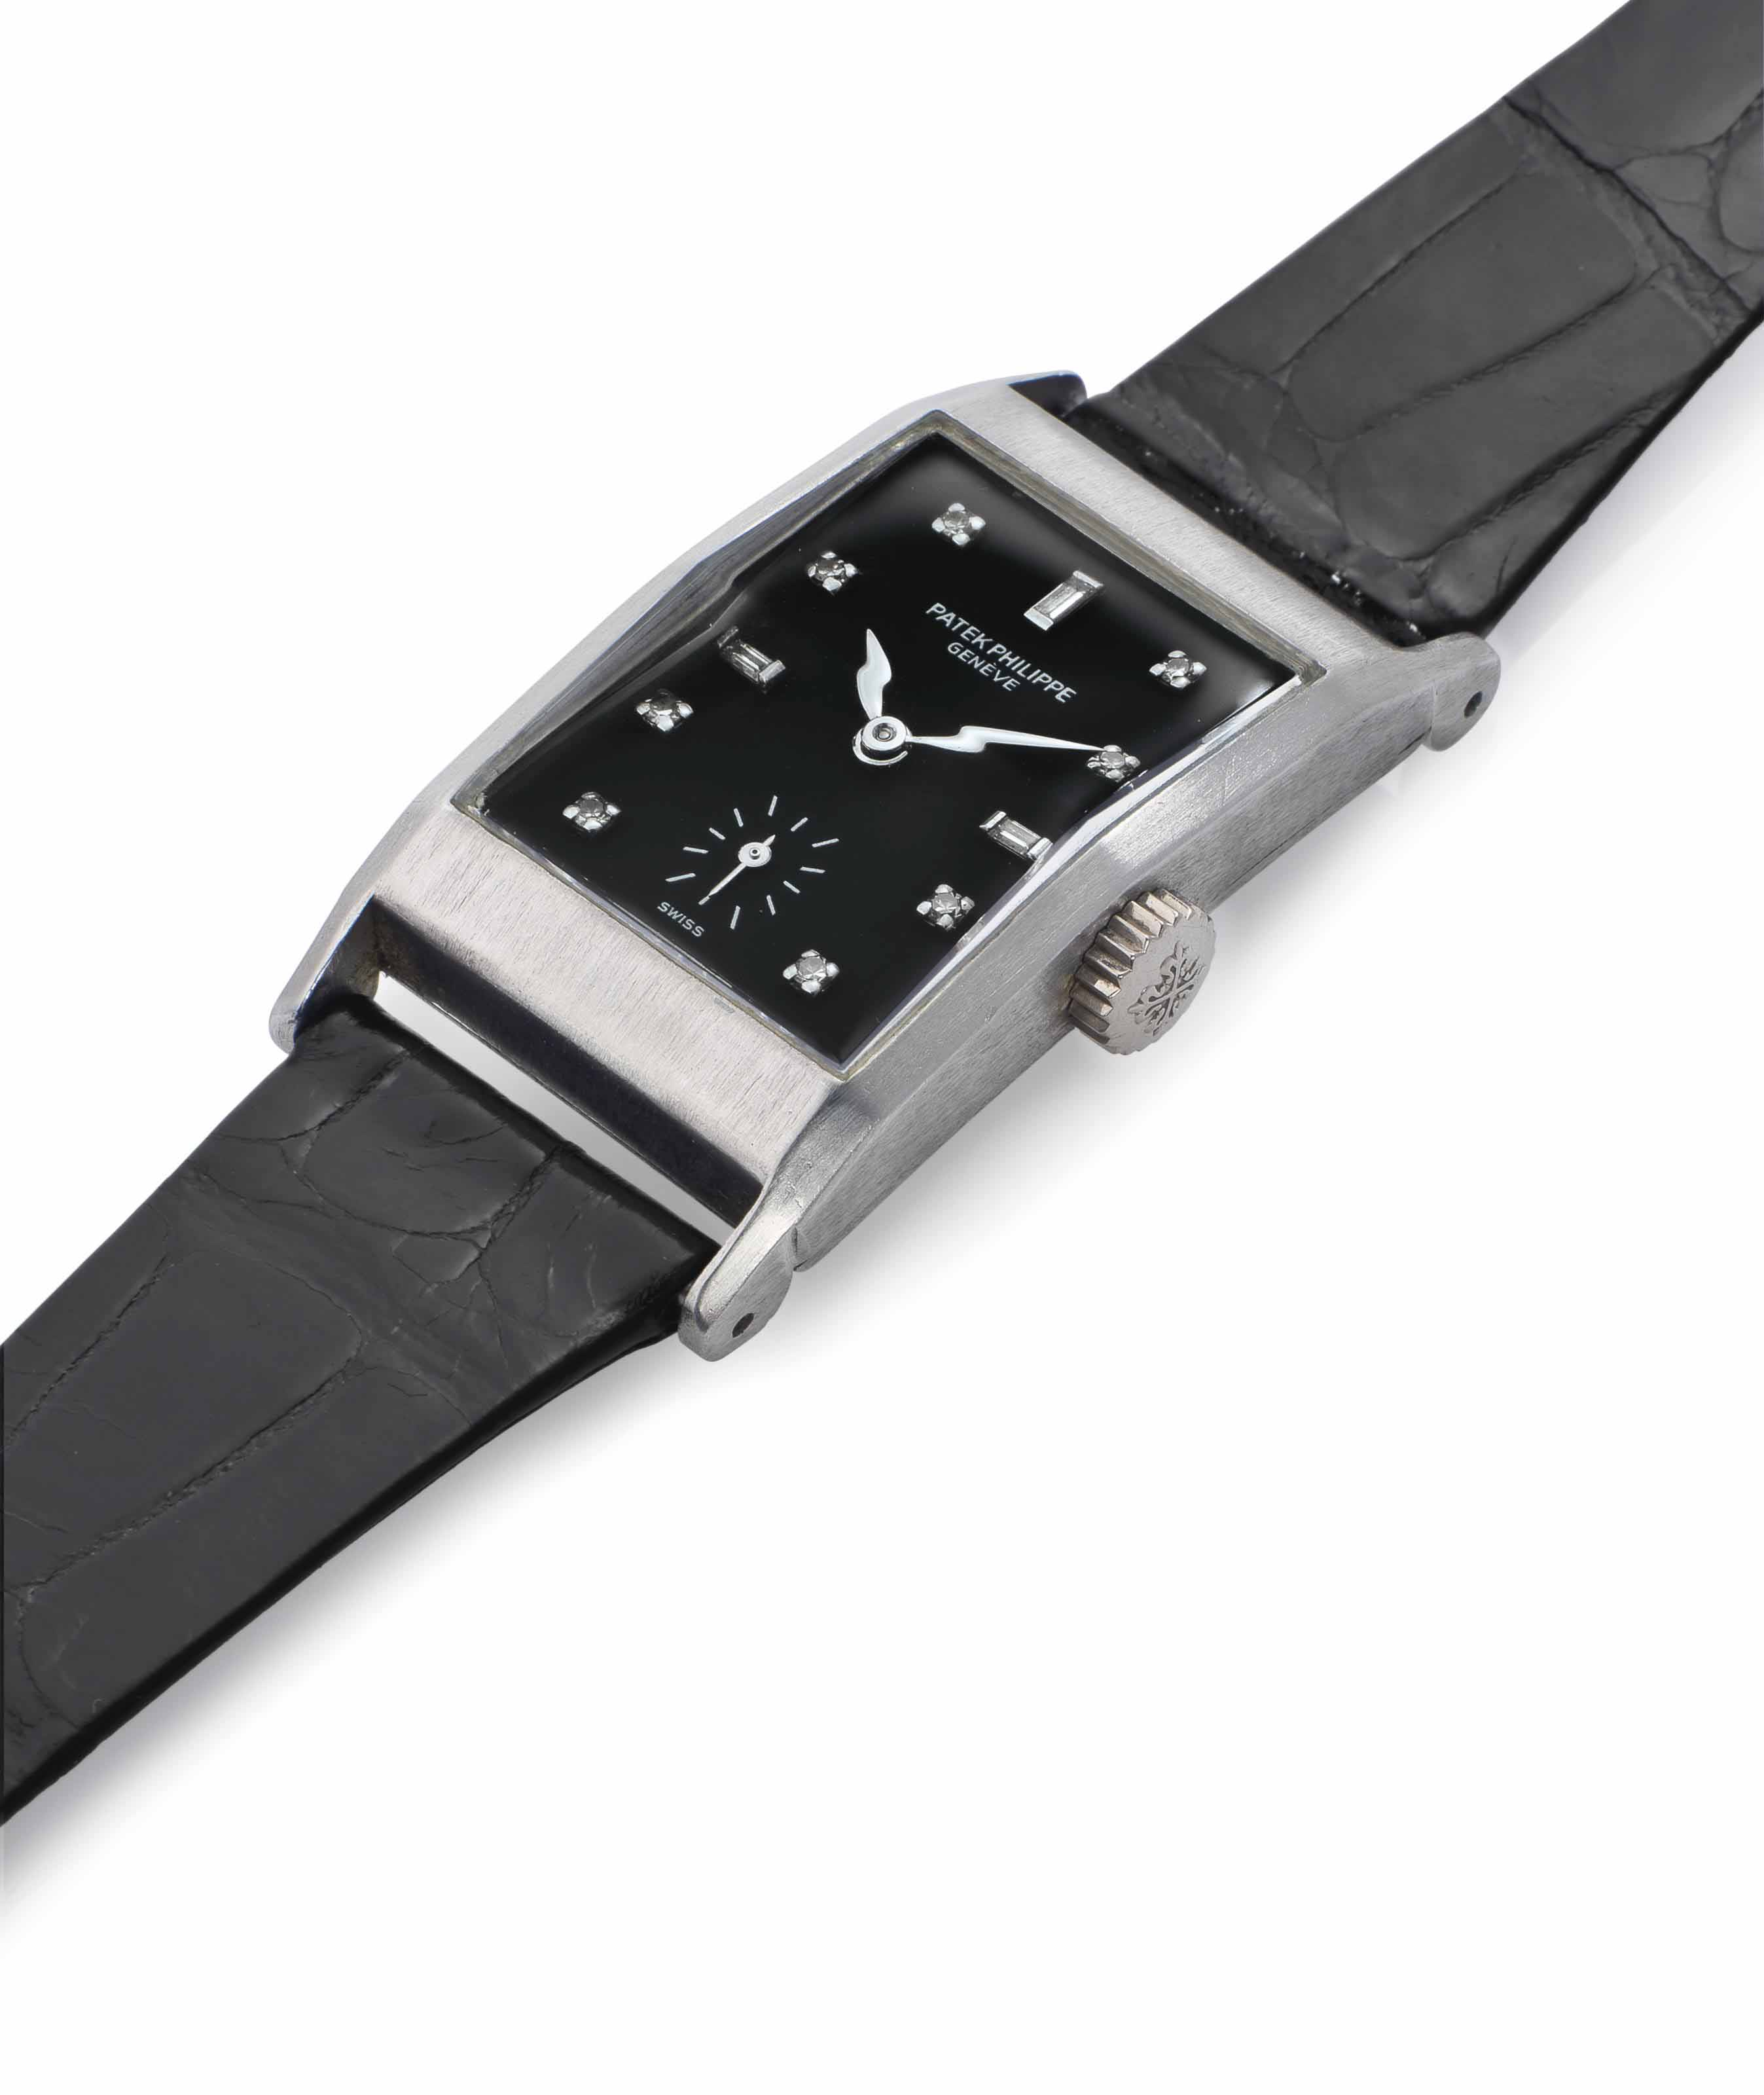 Patek Philippe. A Fine and Very Rare Platinum and Diamond-Set Rectangular Wristwatch with Black Dial